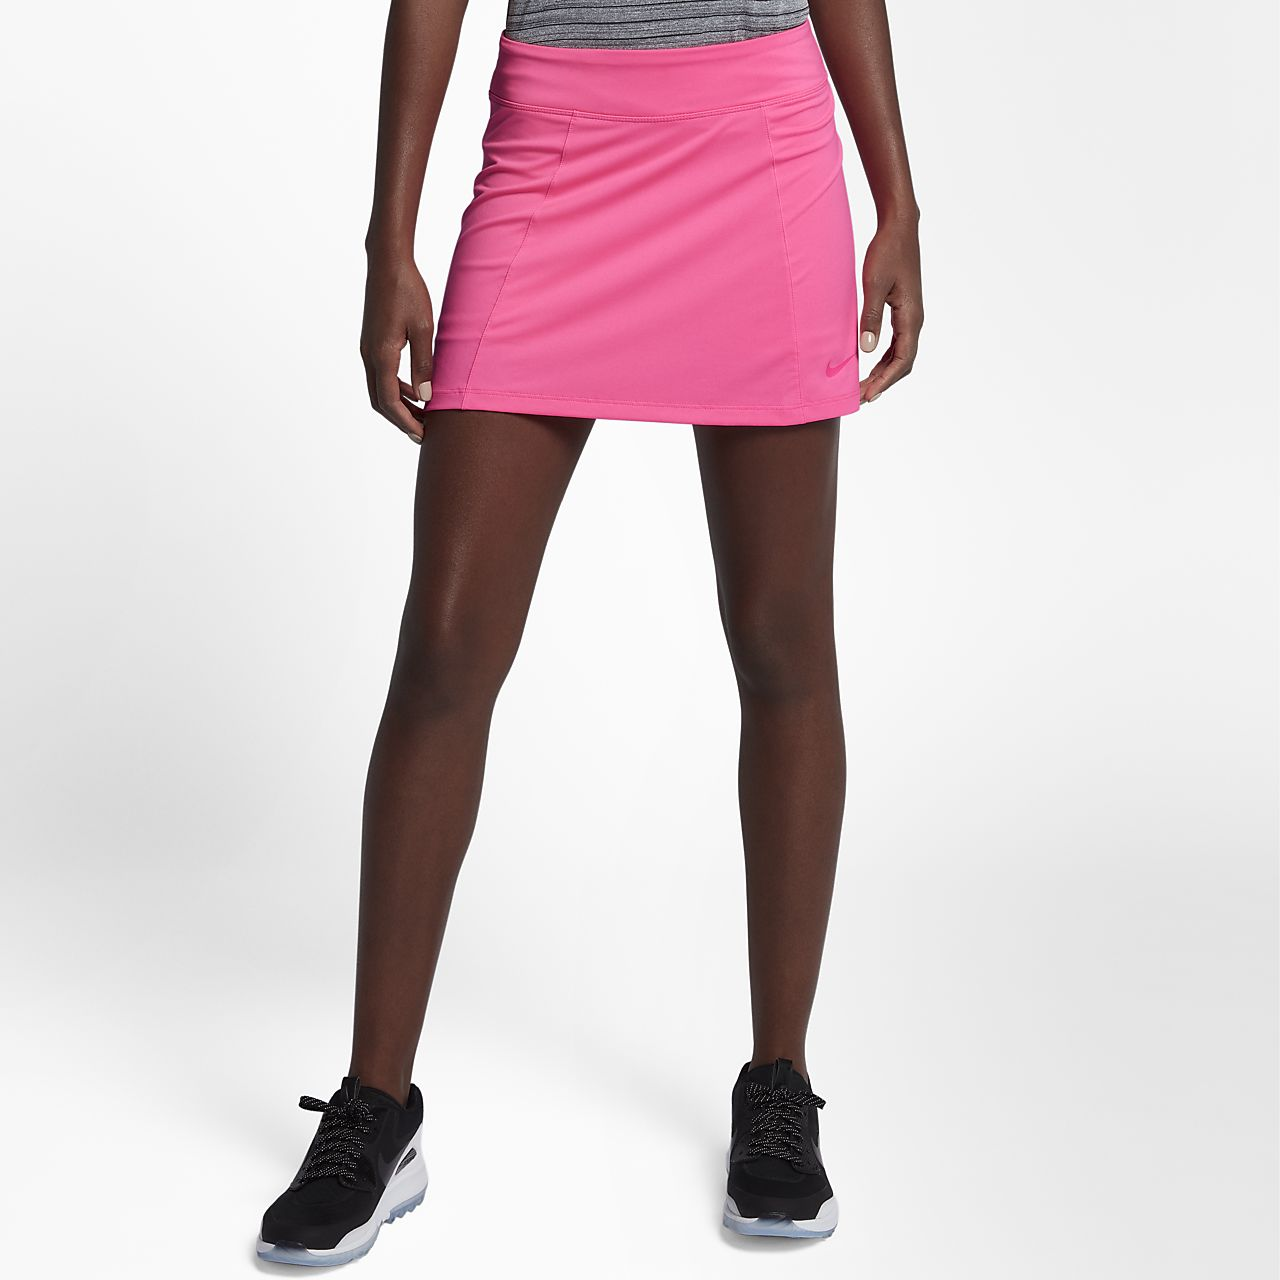 "Golf Skort Nike Dry Women's 14.5"" (37cm approx.) Golf Skort"